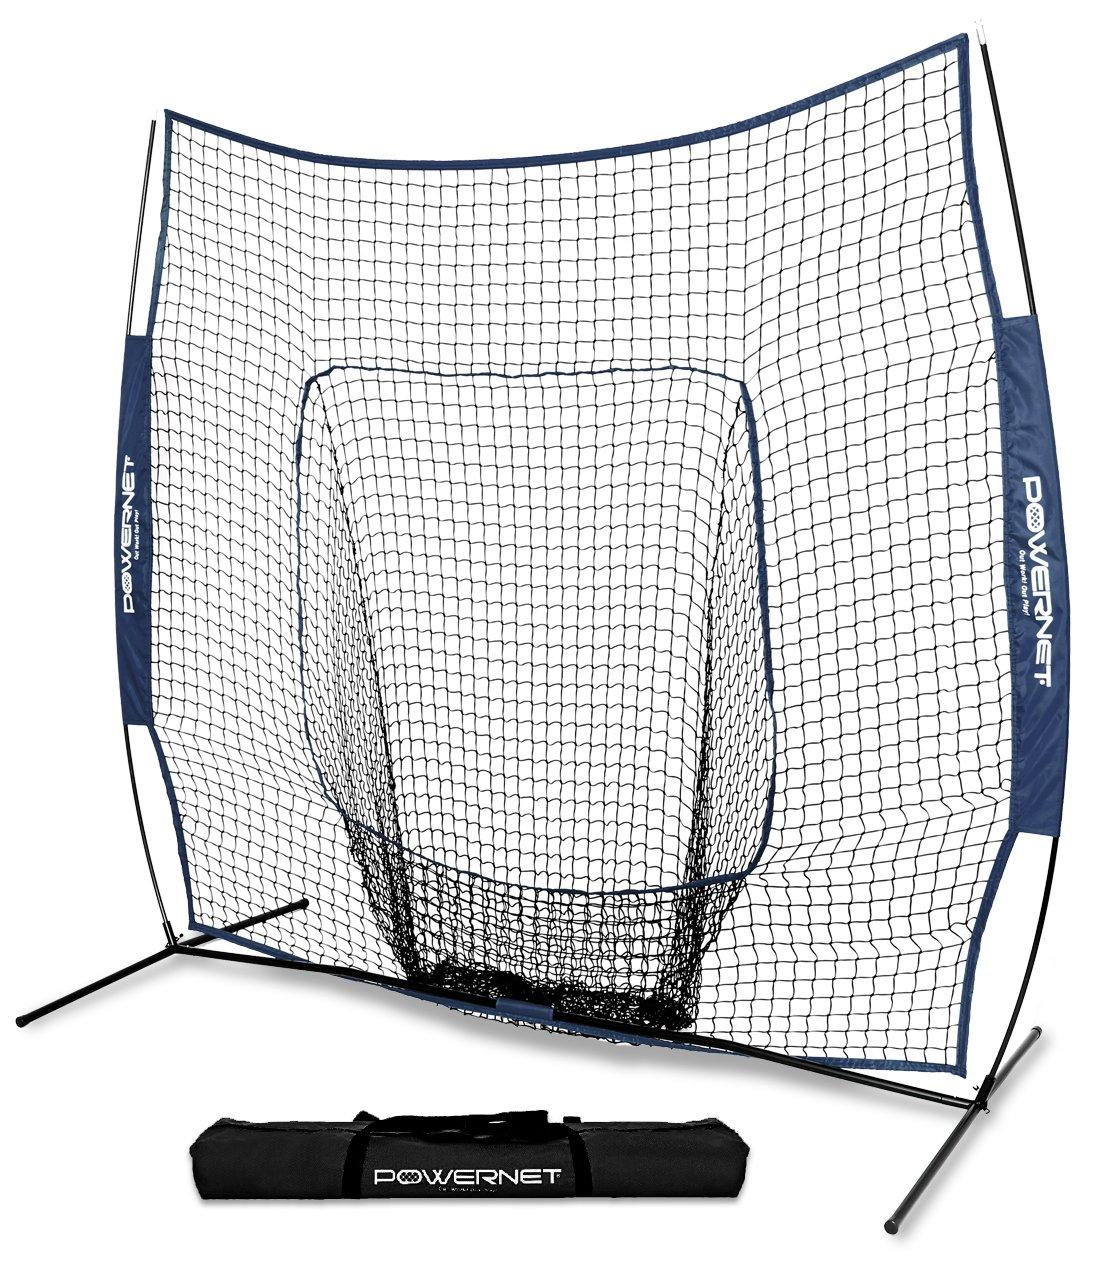 PowerNet Team Color Baseball Softball 7x7 Hitting Net w/Bow Frame (Navy) by PowerNet